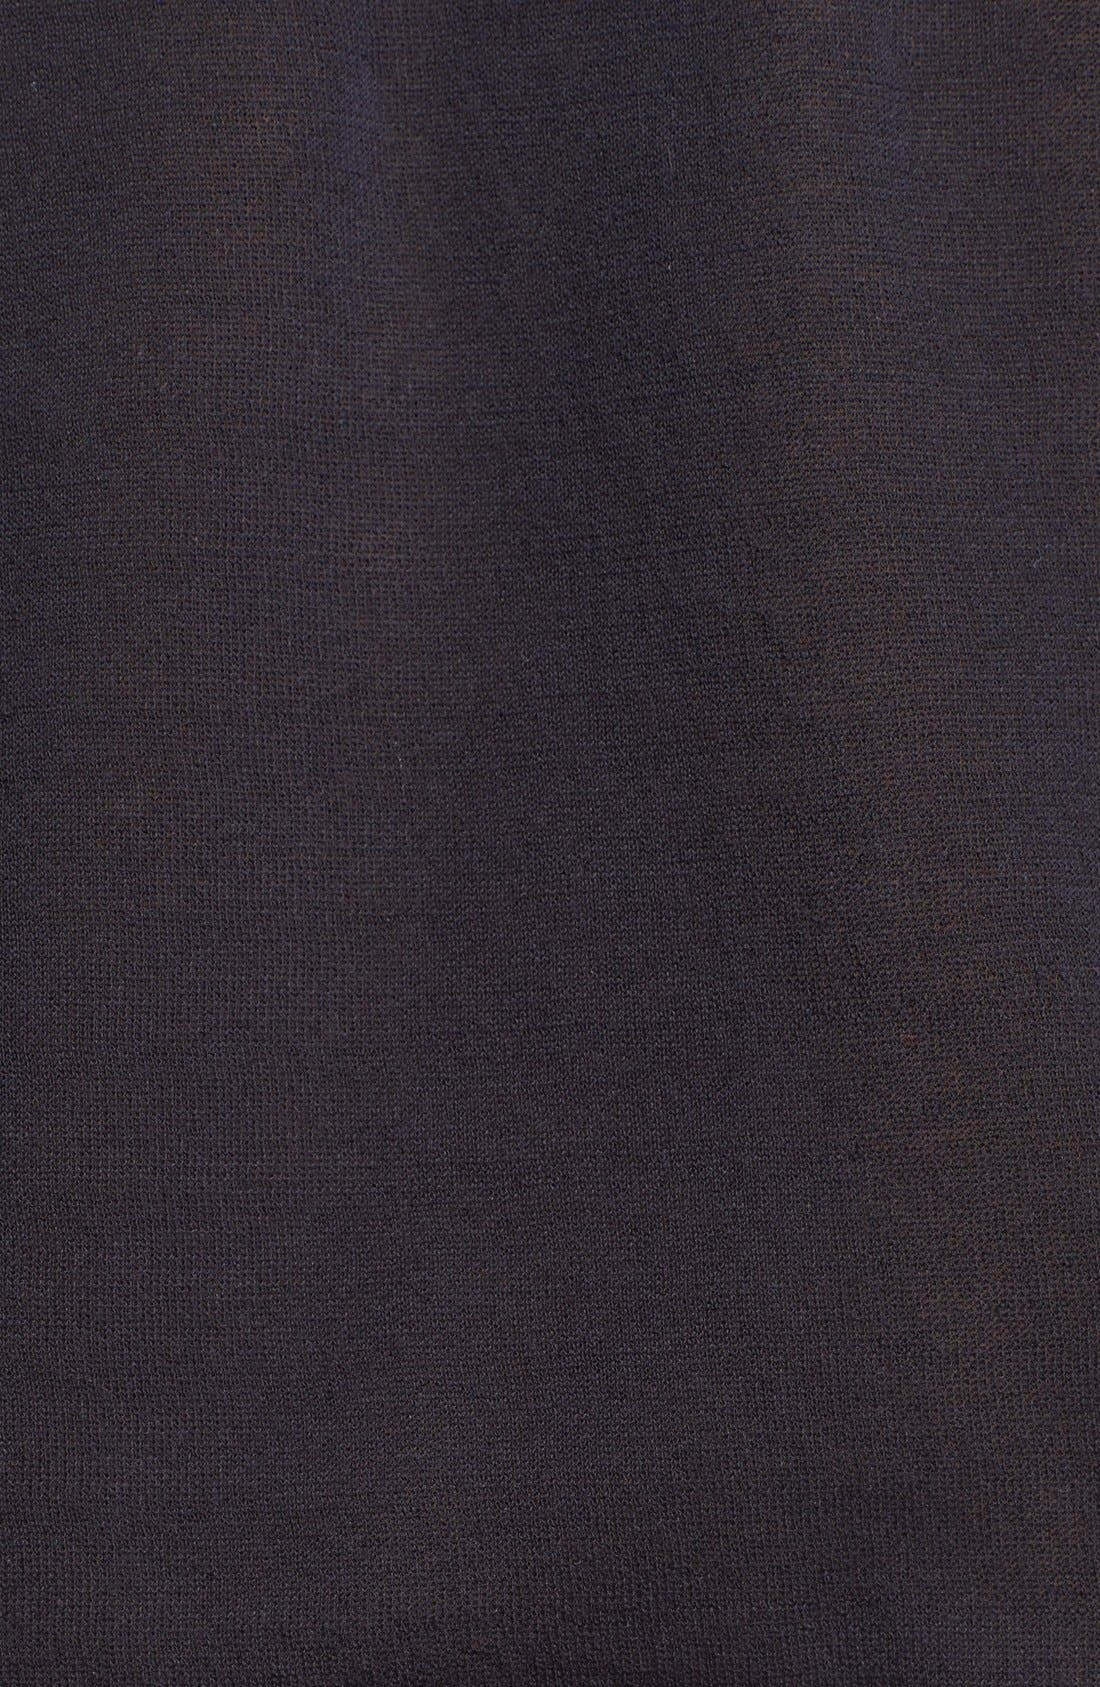 Alternate Image 3  - Tory Burch 'Harriet' Knit Shell